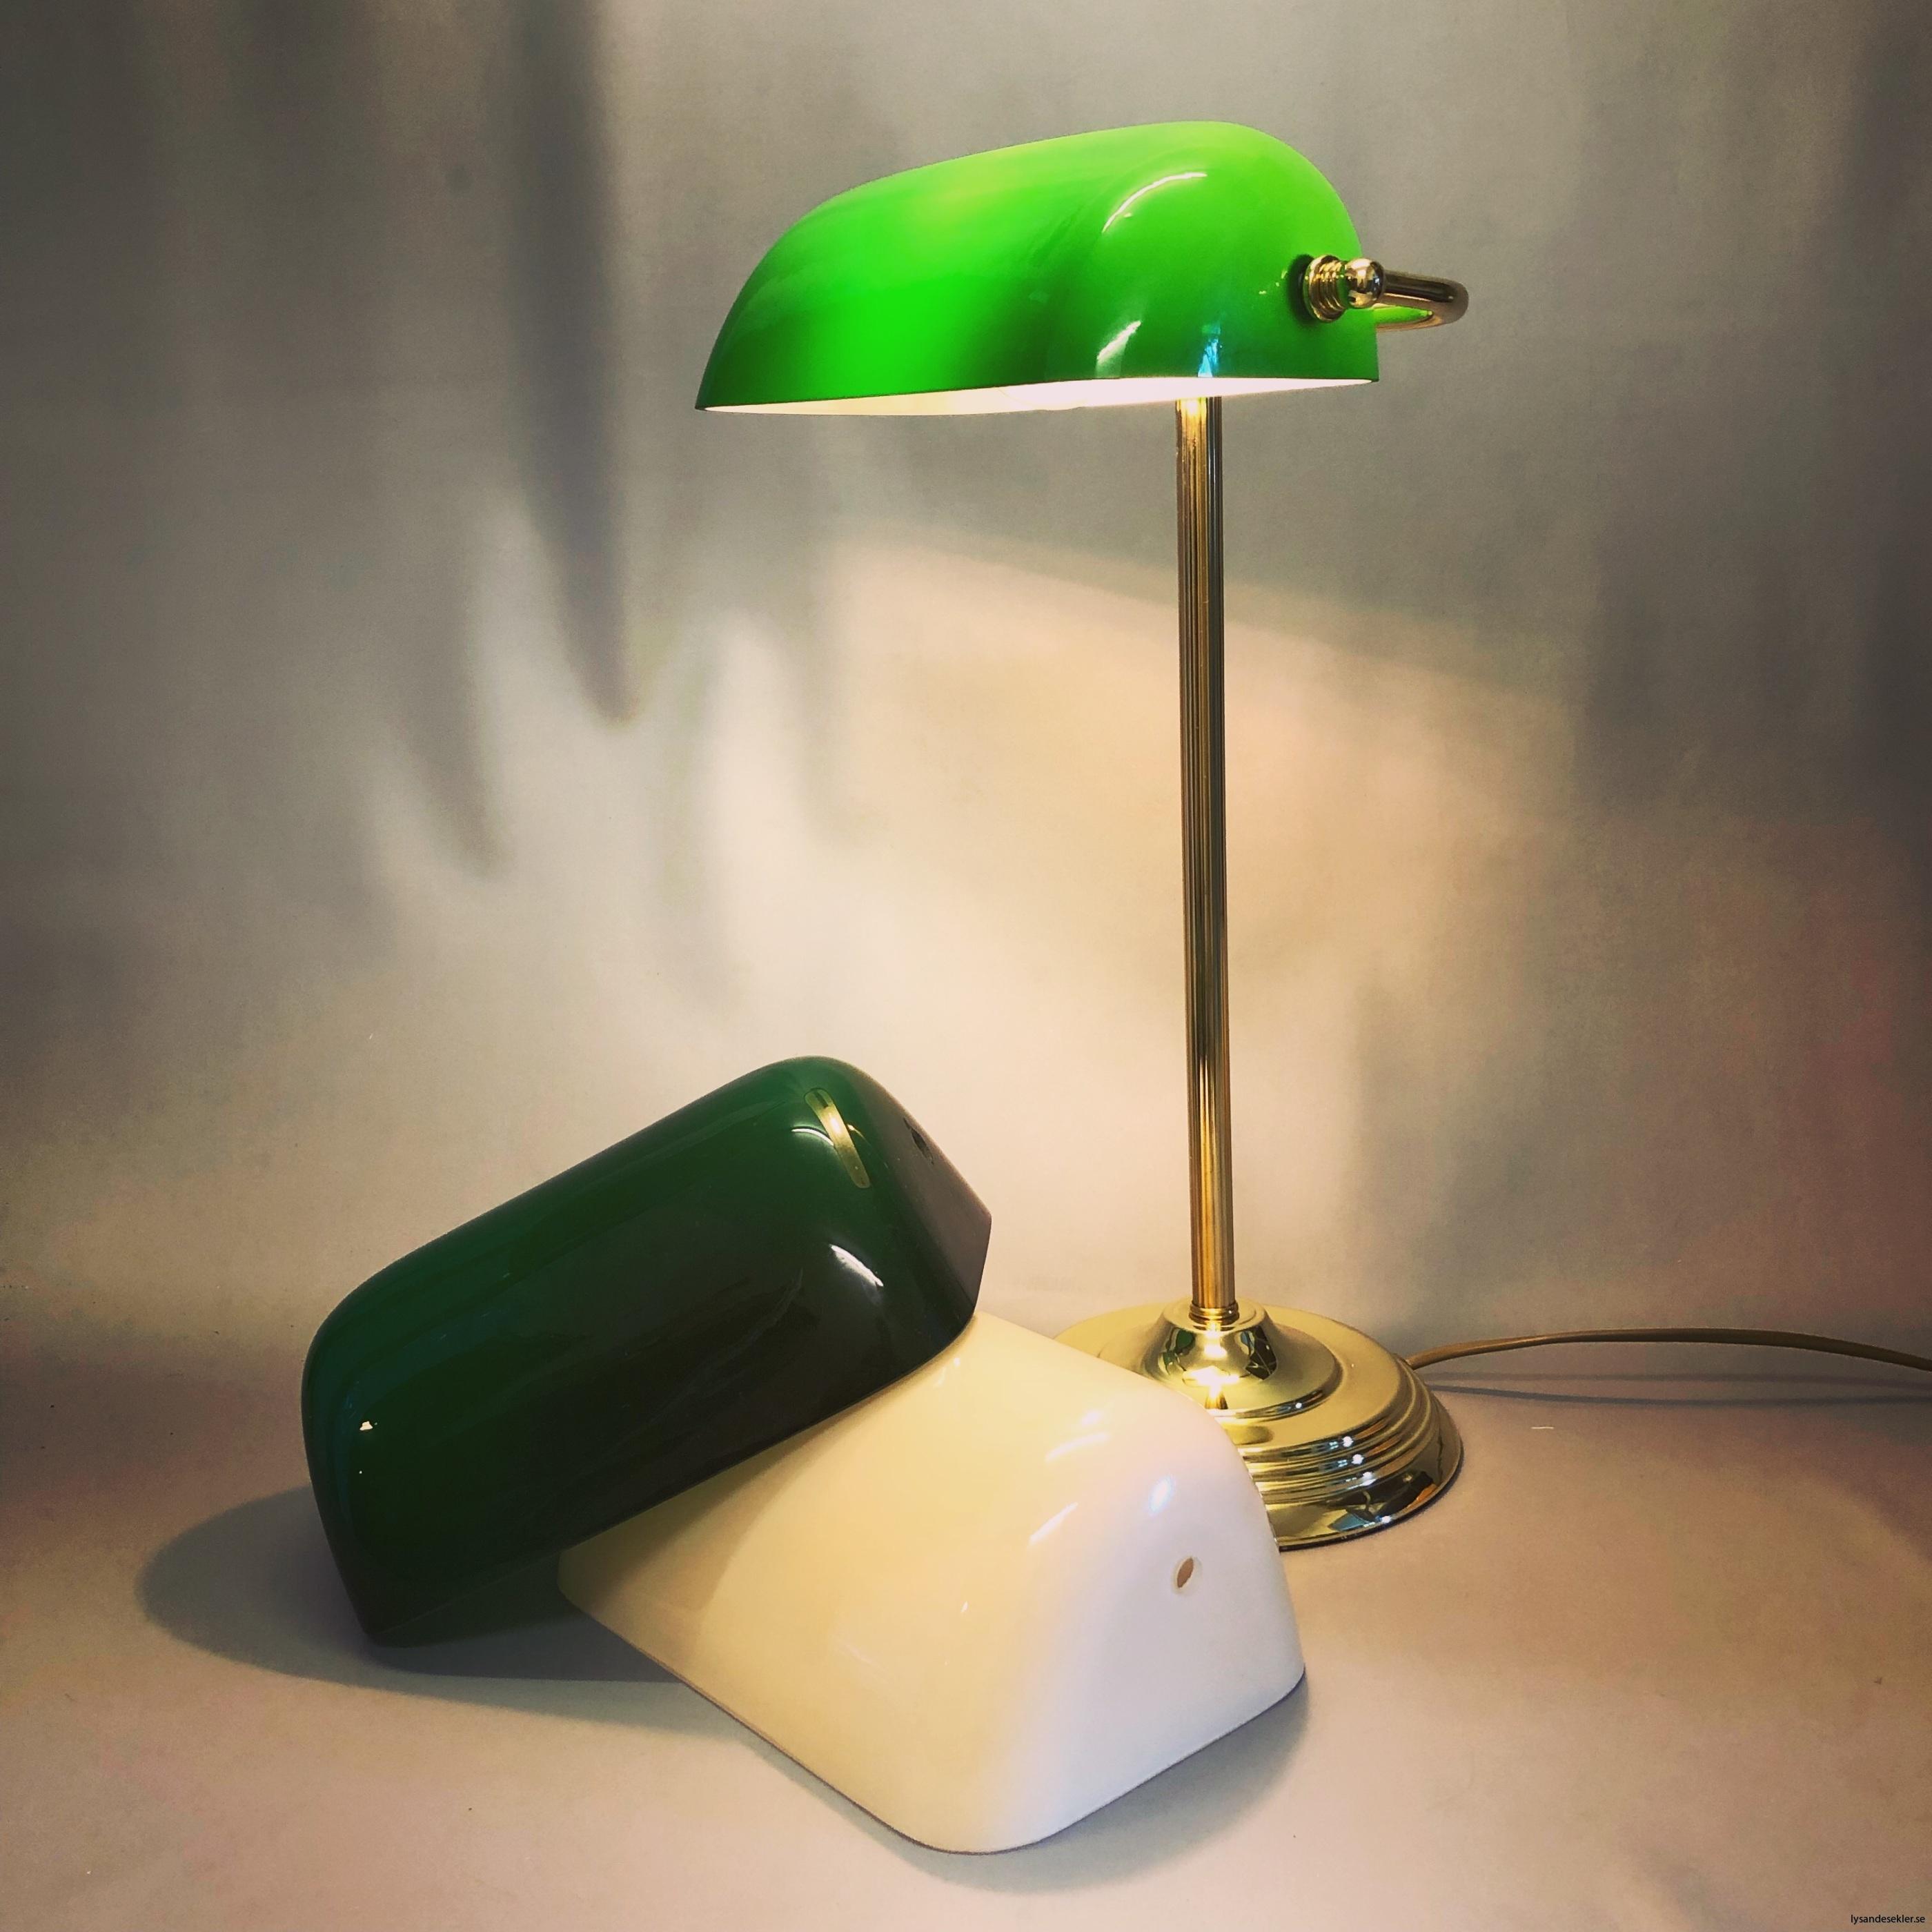 reservglas bankirlampa bibliotekslampa amerikalampa grönt lampglas gult reservglas extraglas1